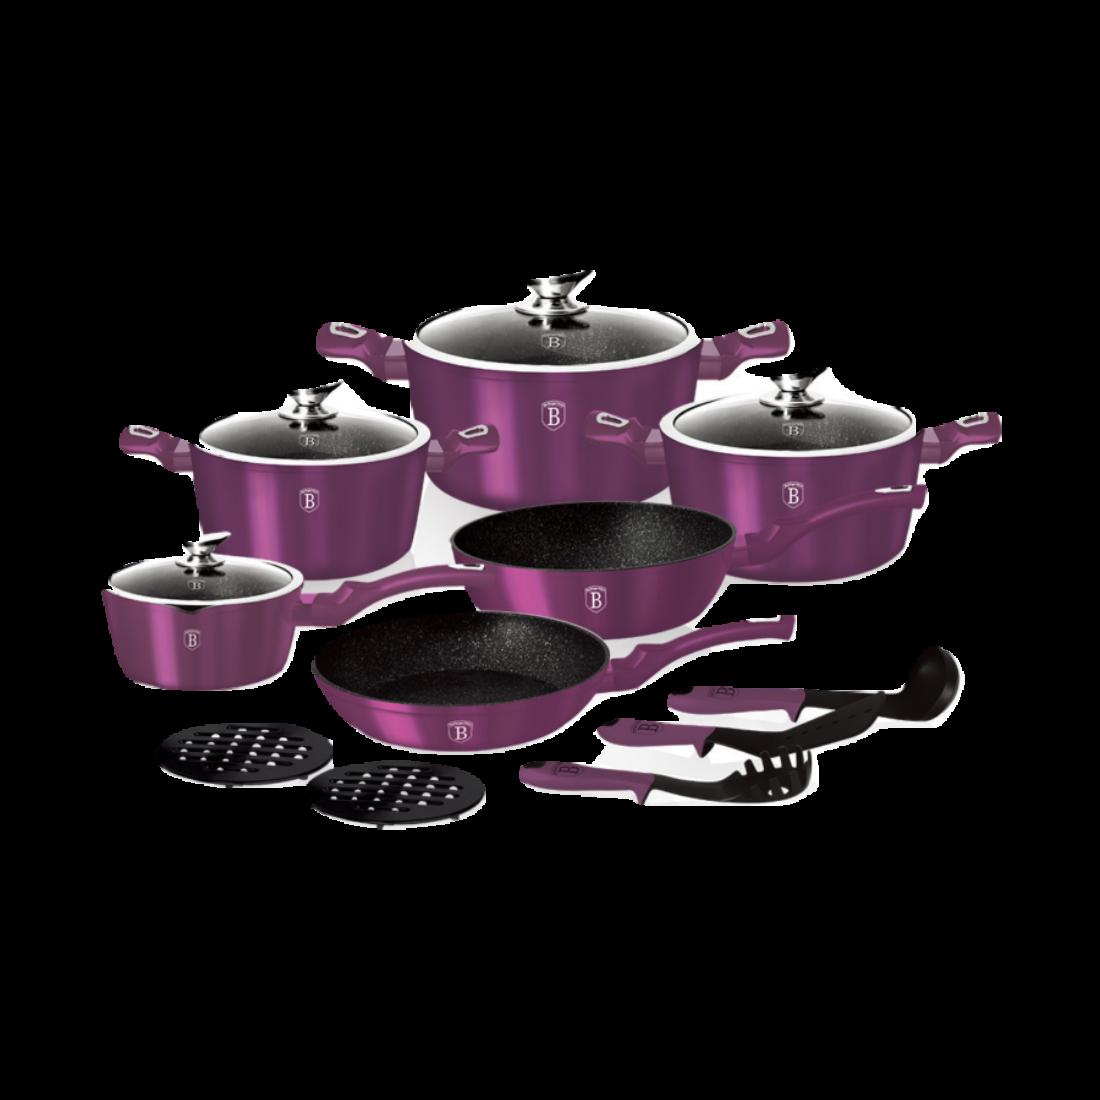 Berlinger Haus 15 részes edénykészlet, Metallic Line Royal Purple Edition